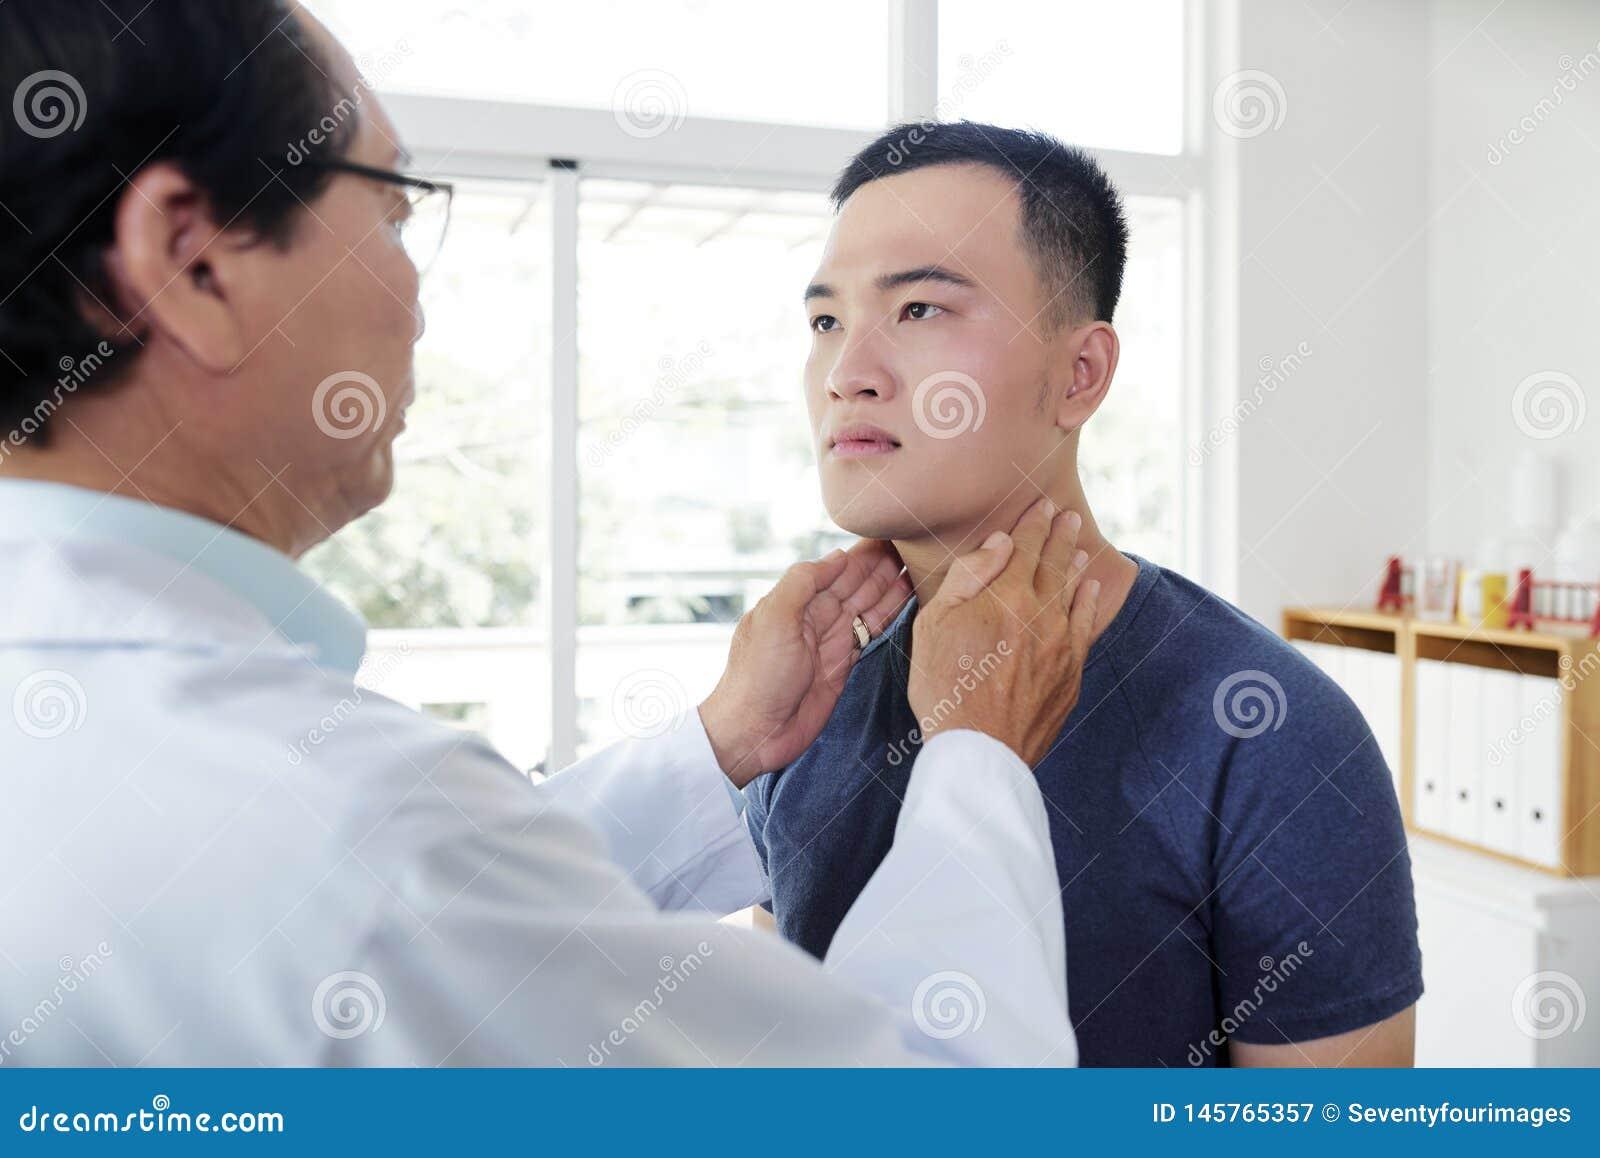 Endocrynologist που ελέγχει το θυροειδή του ασθενή